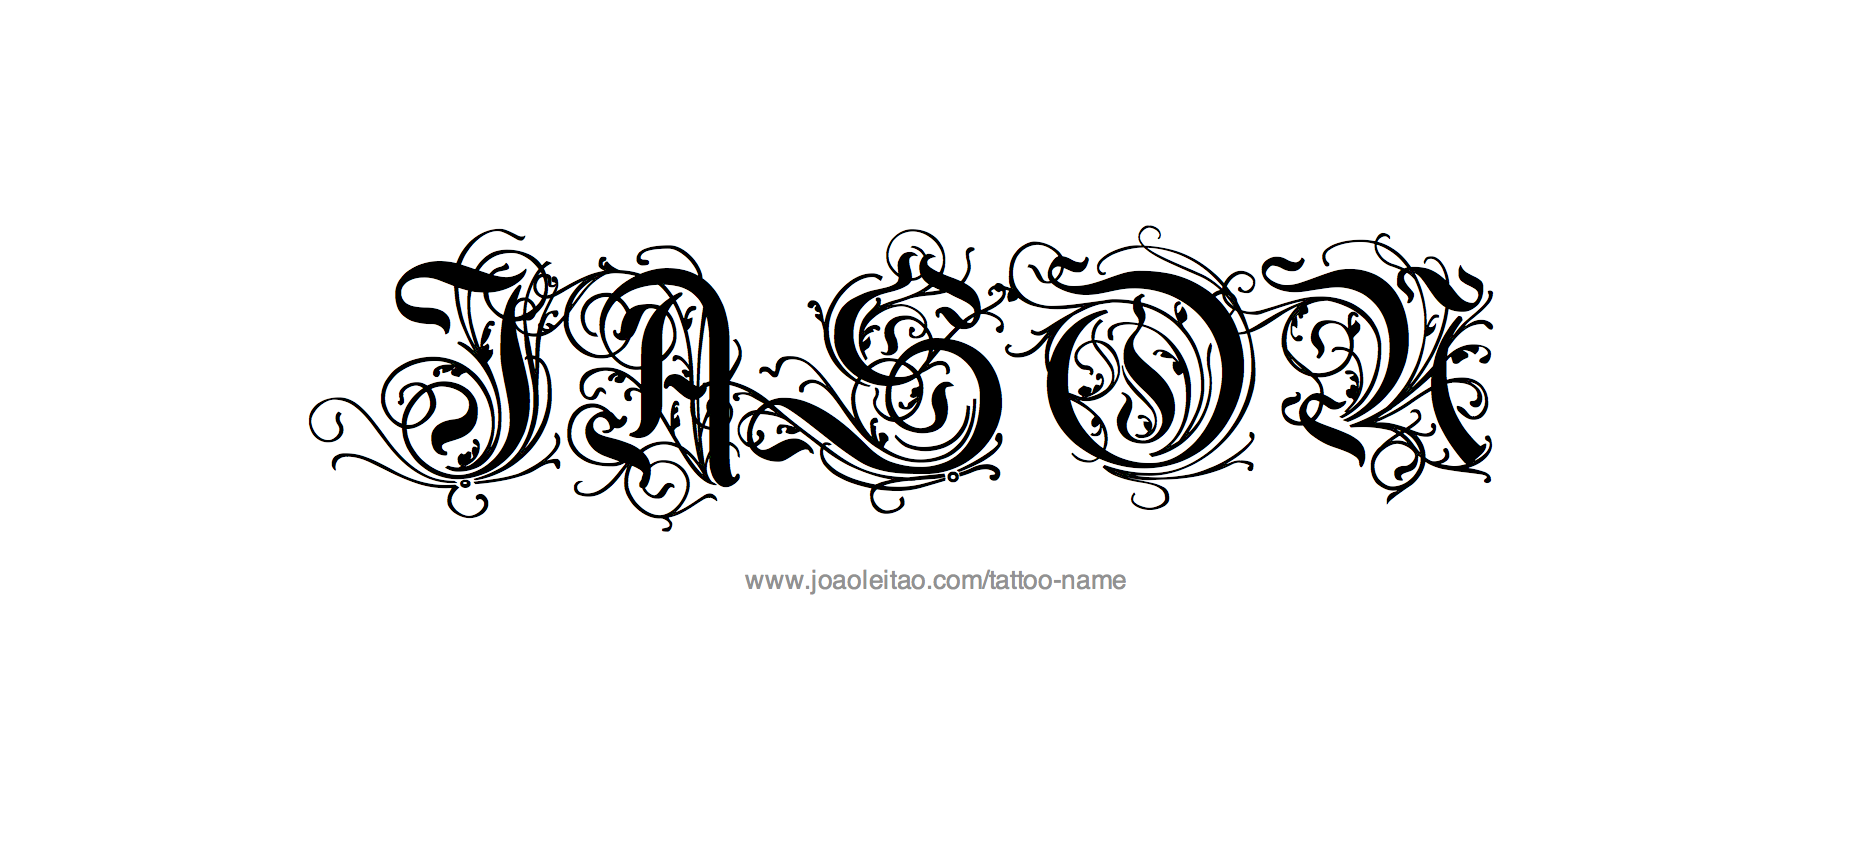 Jason Name Tattoo Designs